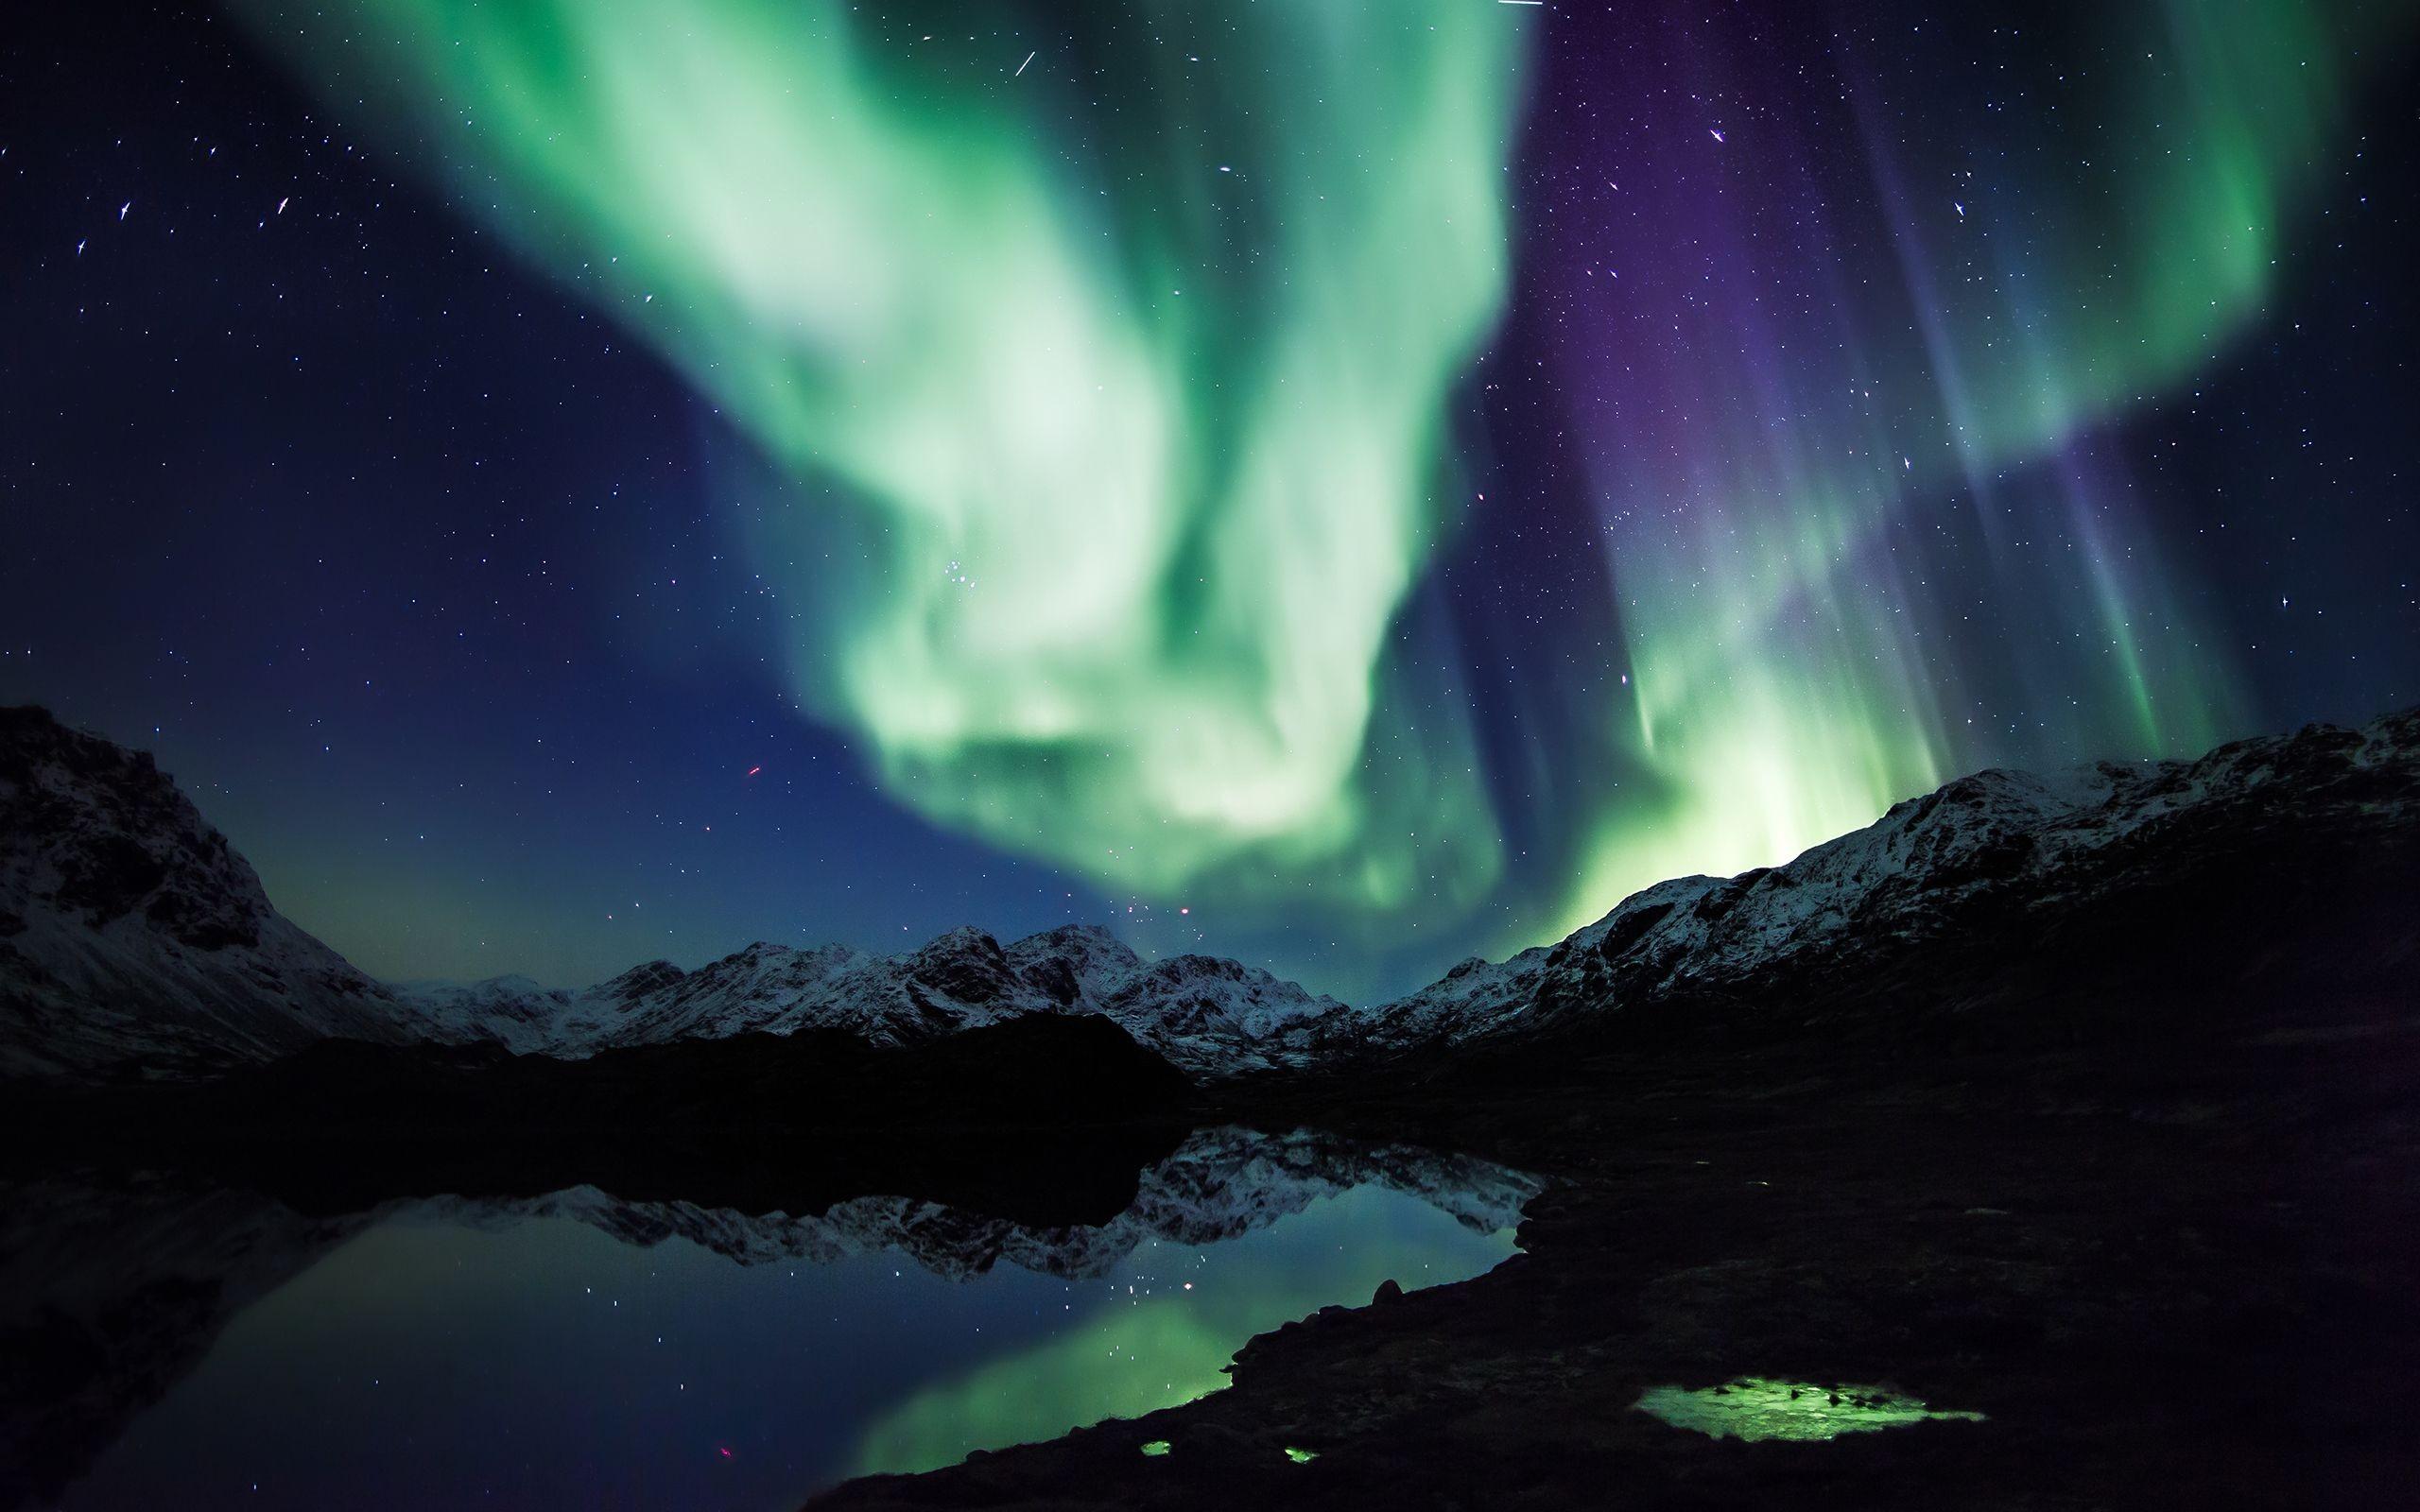 Aurora borealis background 66 images for Sfondi desktop aurora boreale